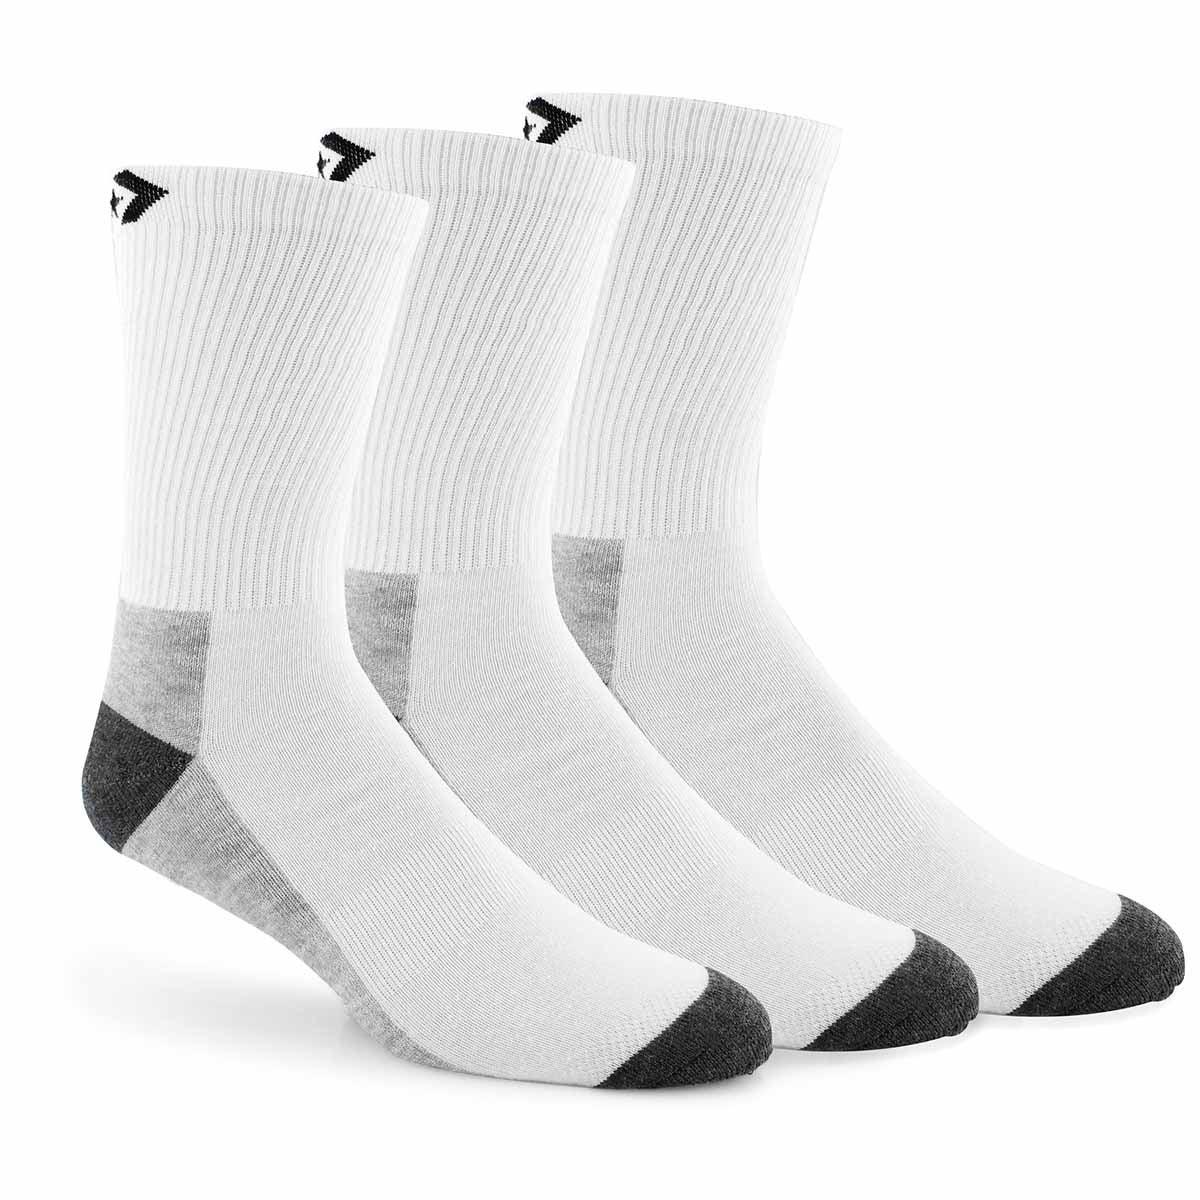 Mns Converse HalfCushionCrew wt sock 3pk